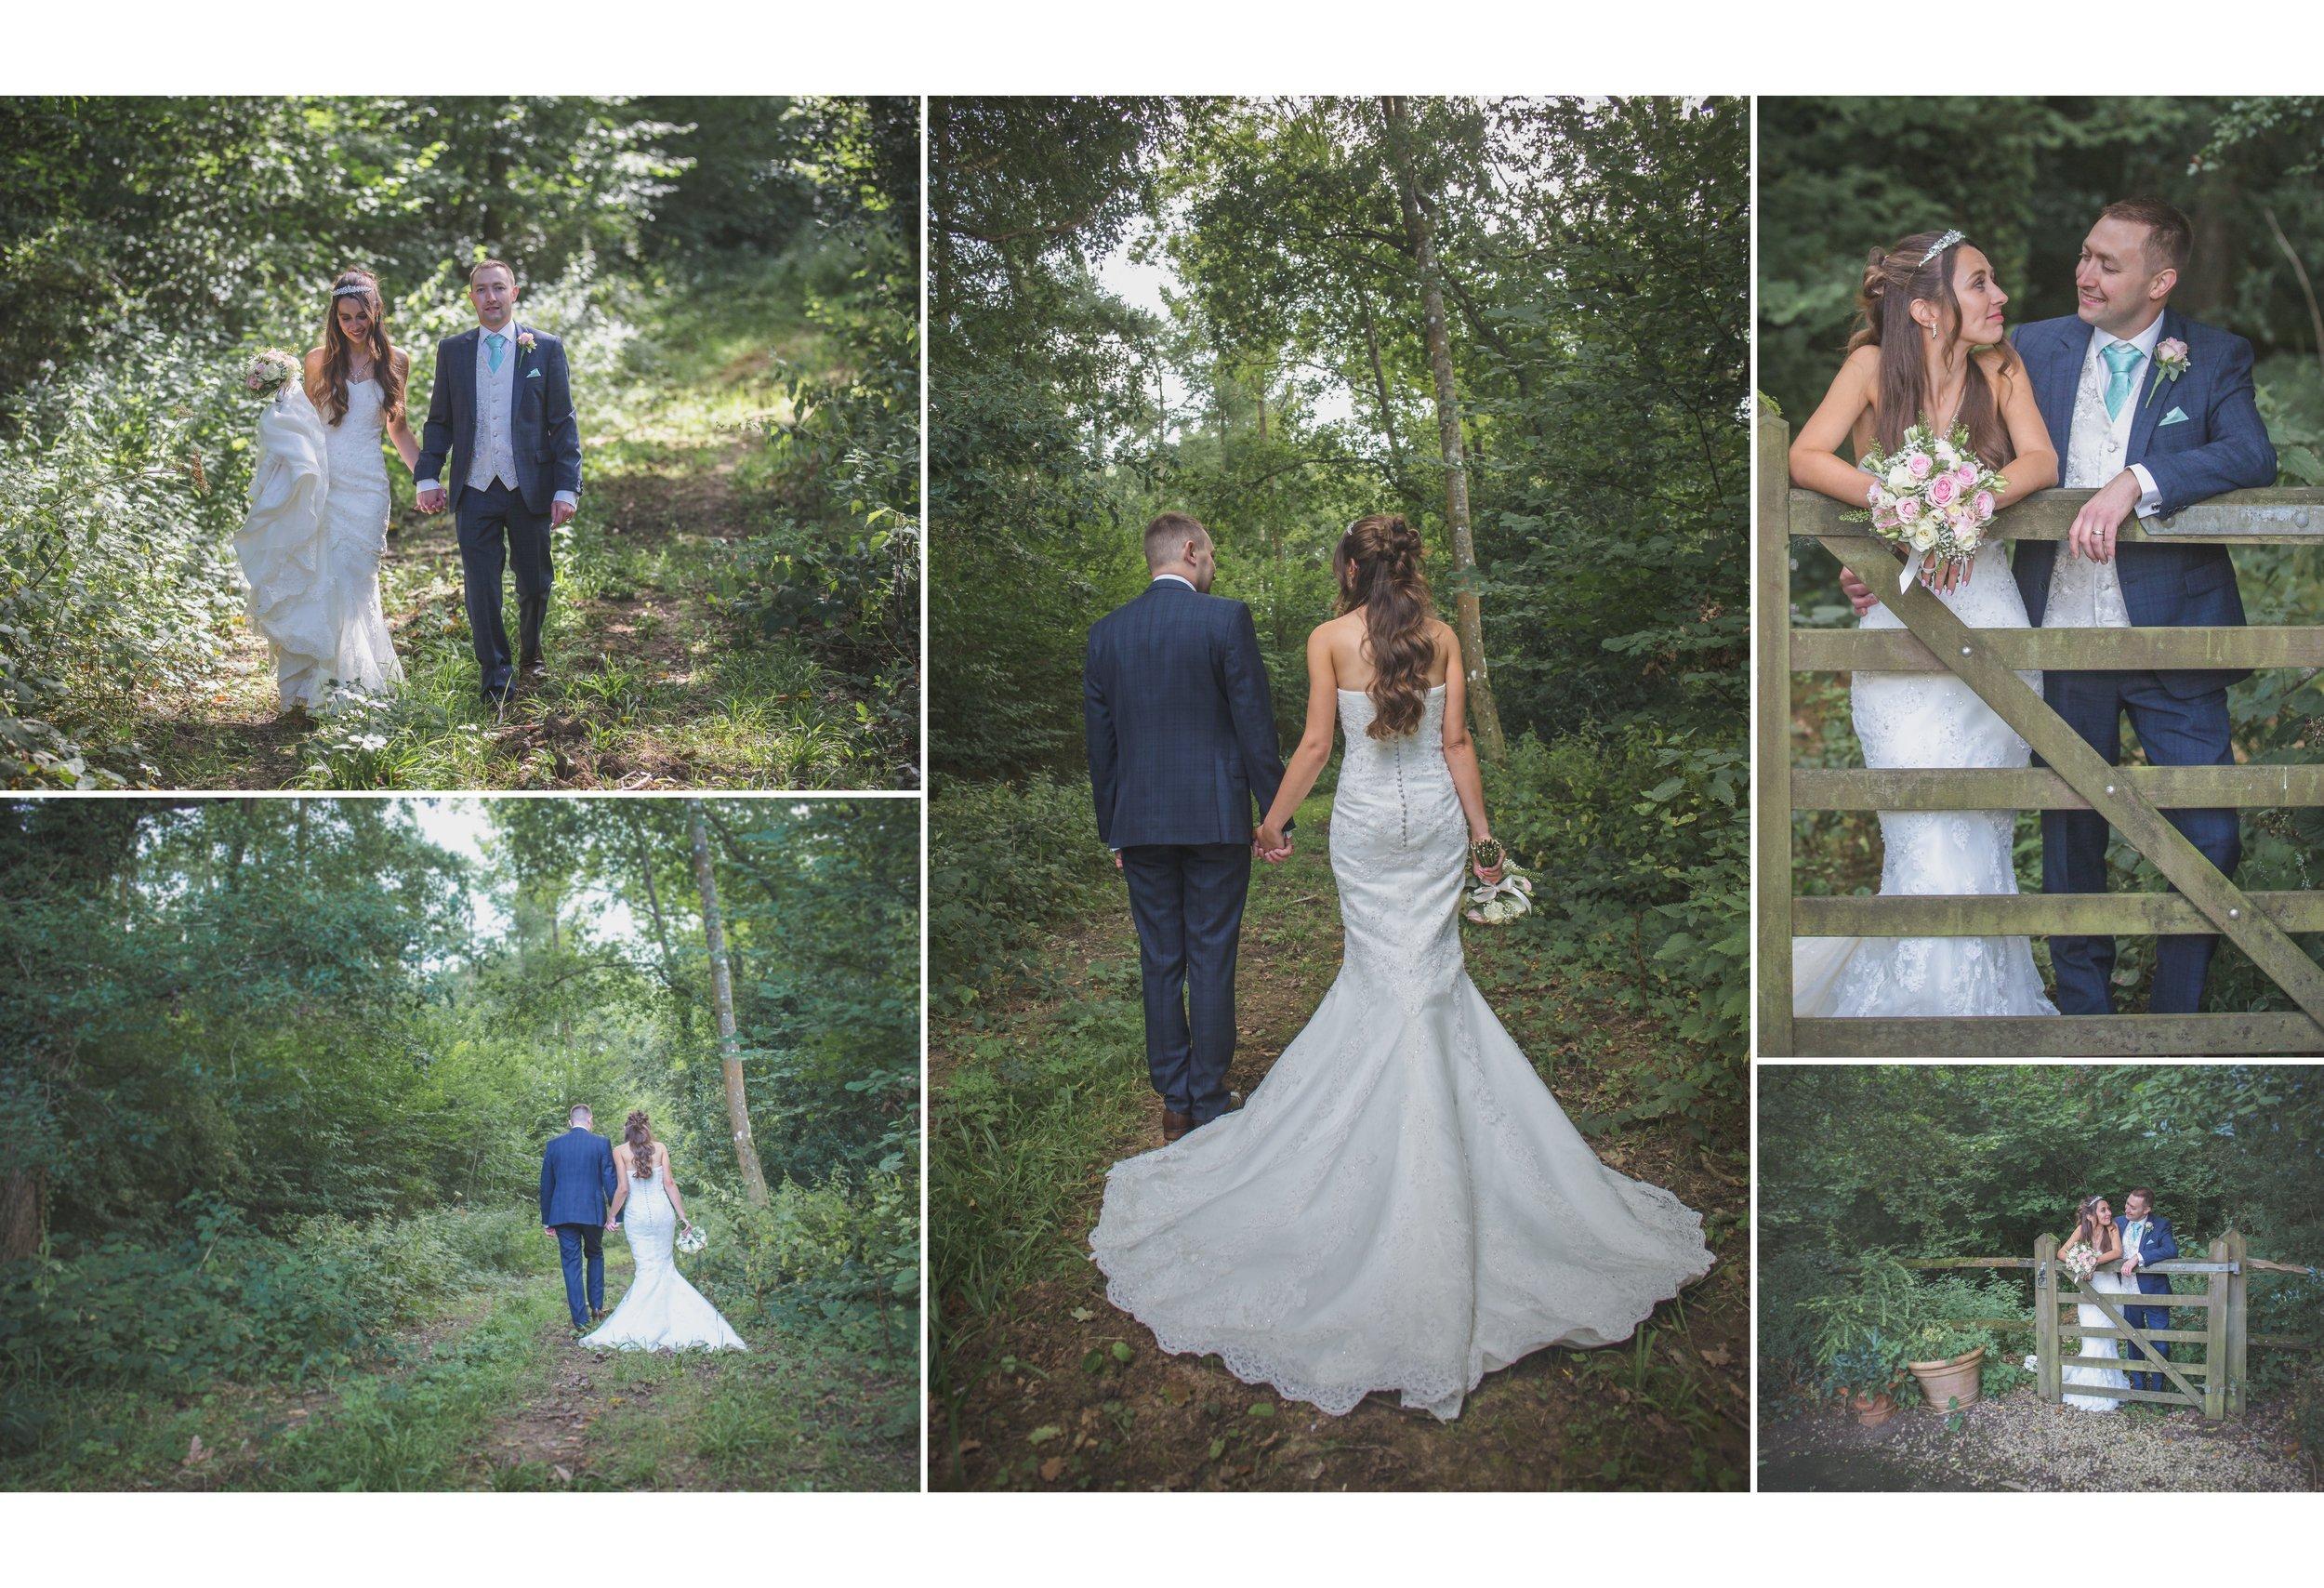 Weddings at Bartholomew barn photographer.jpg